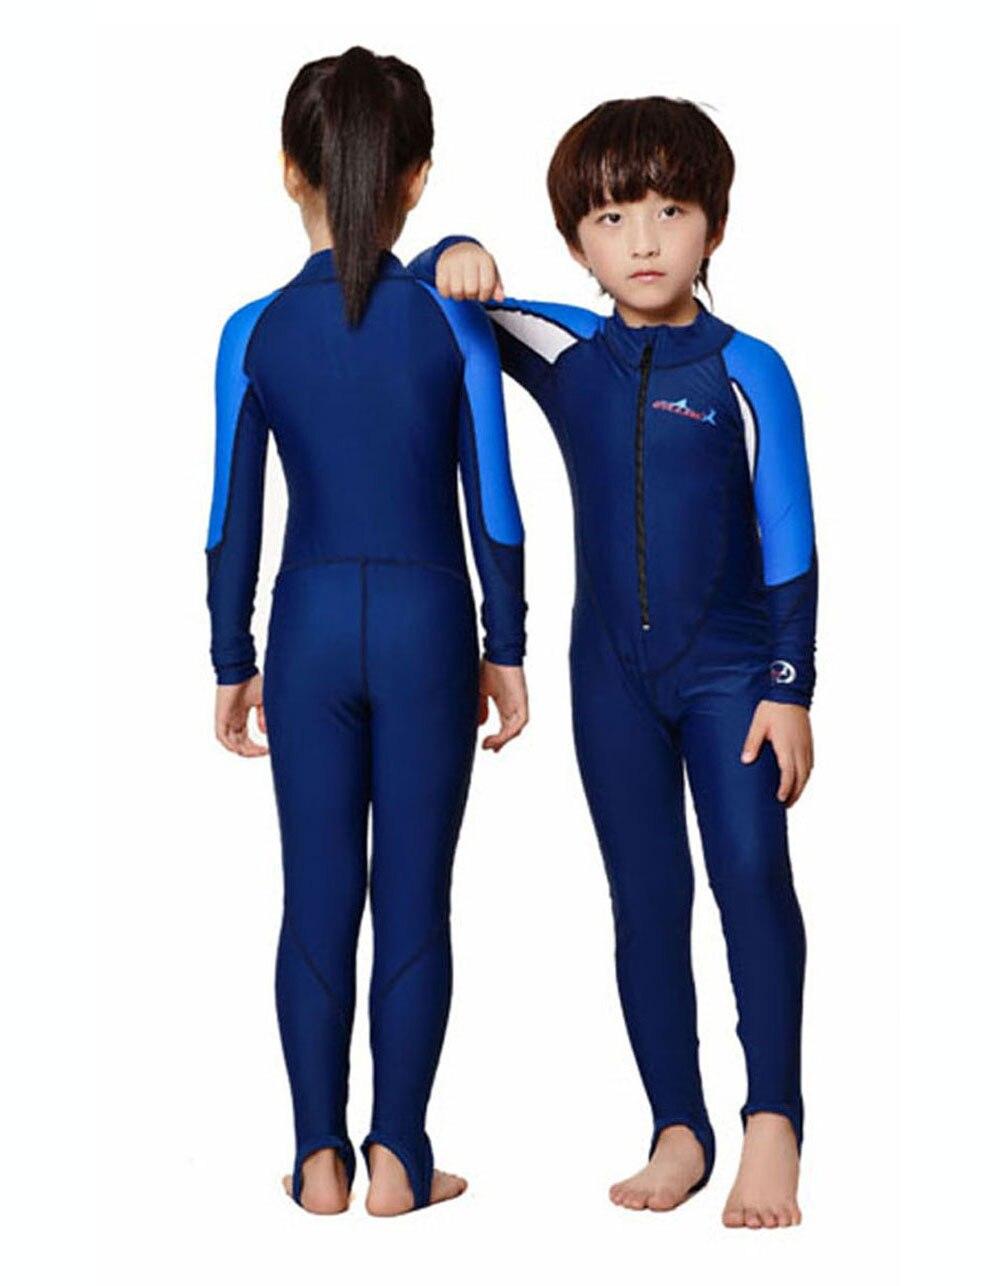 Kids Swim Suit Youth Basic Skins Long Sleeve Jumpsuit Crew Rash